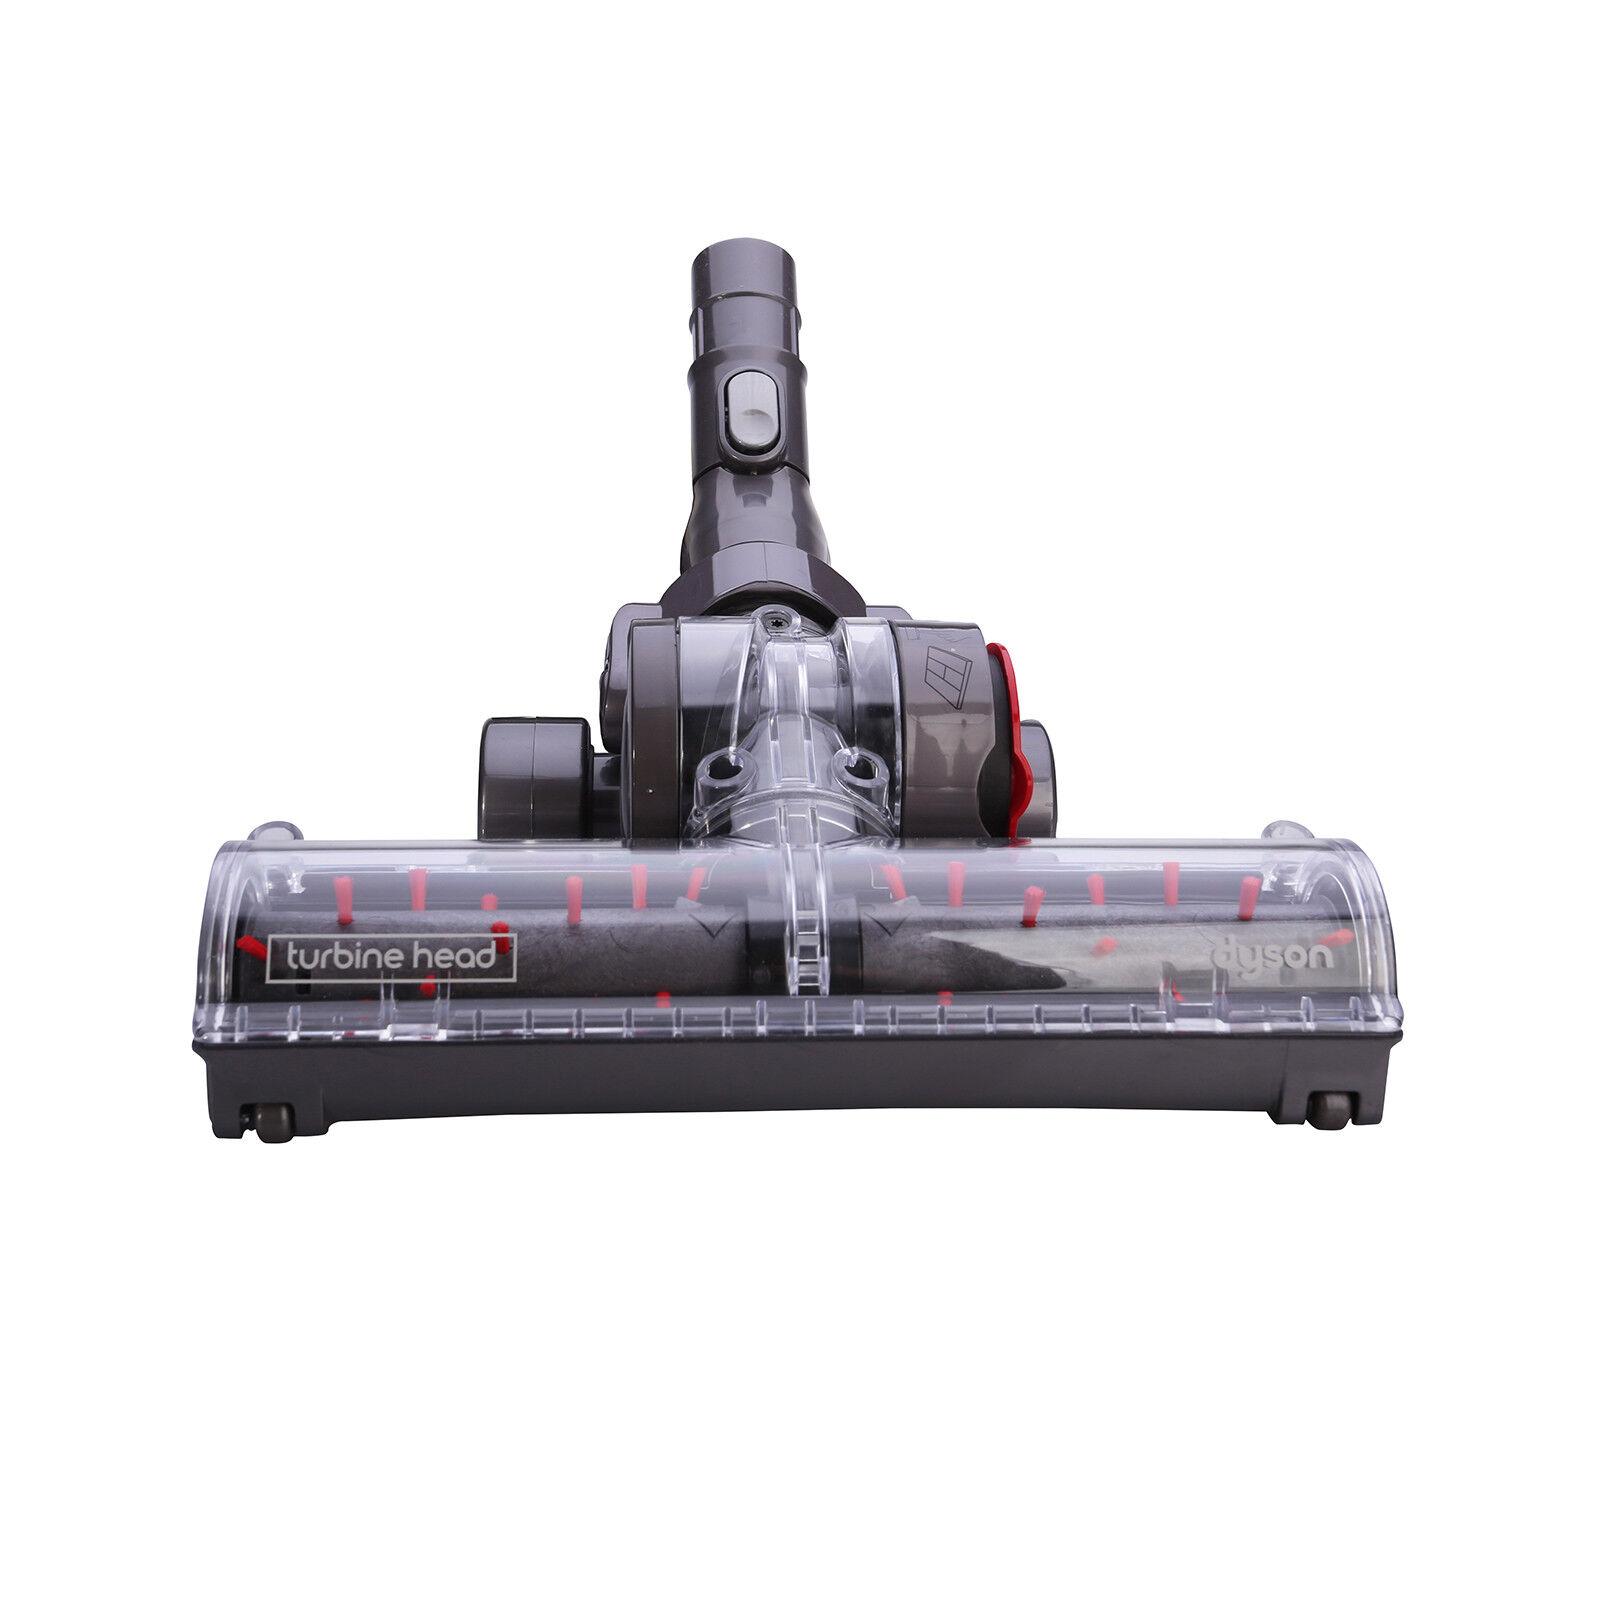 Dyson dc32 vacuum фен для укладки дайсон